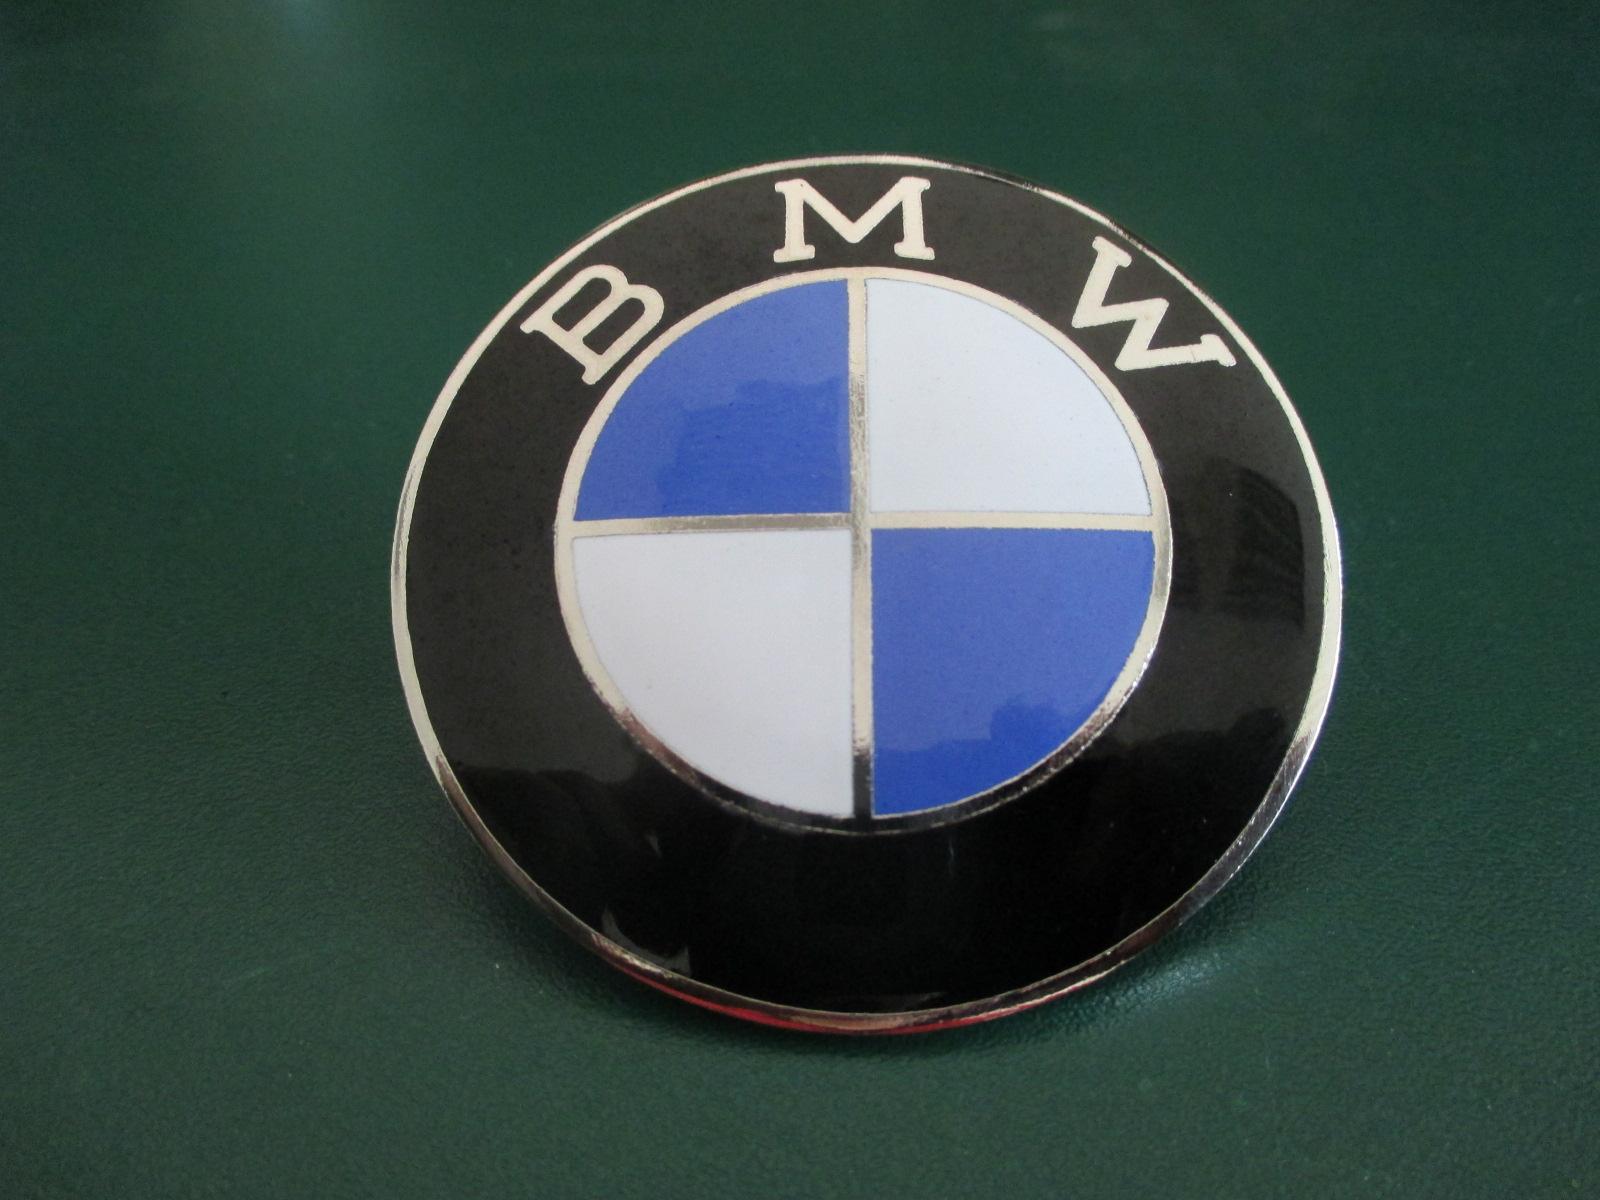 bmw emblem 60mm emailliert-3030011246